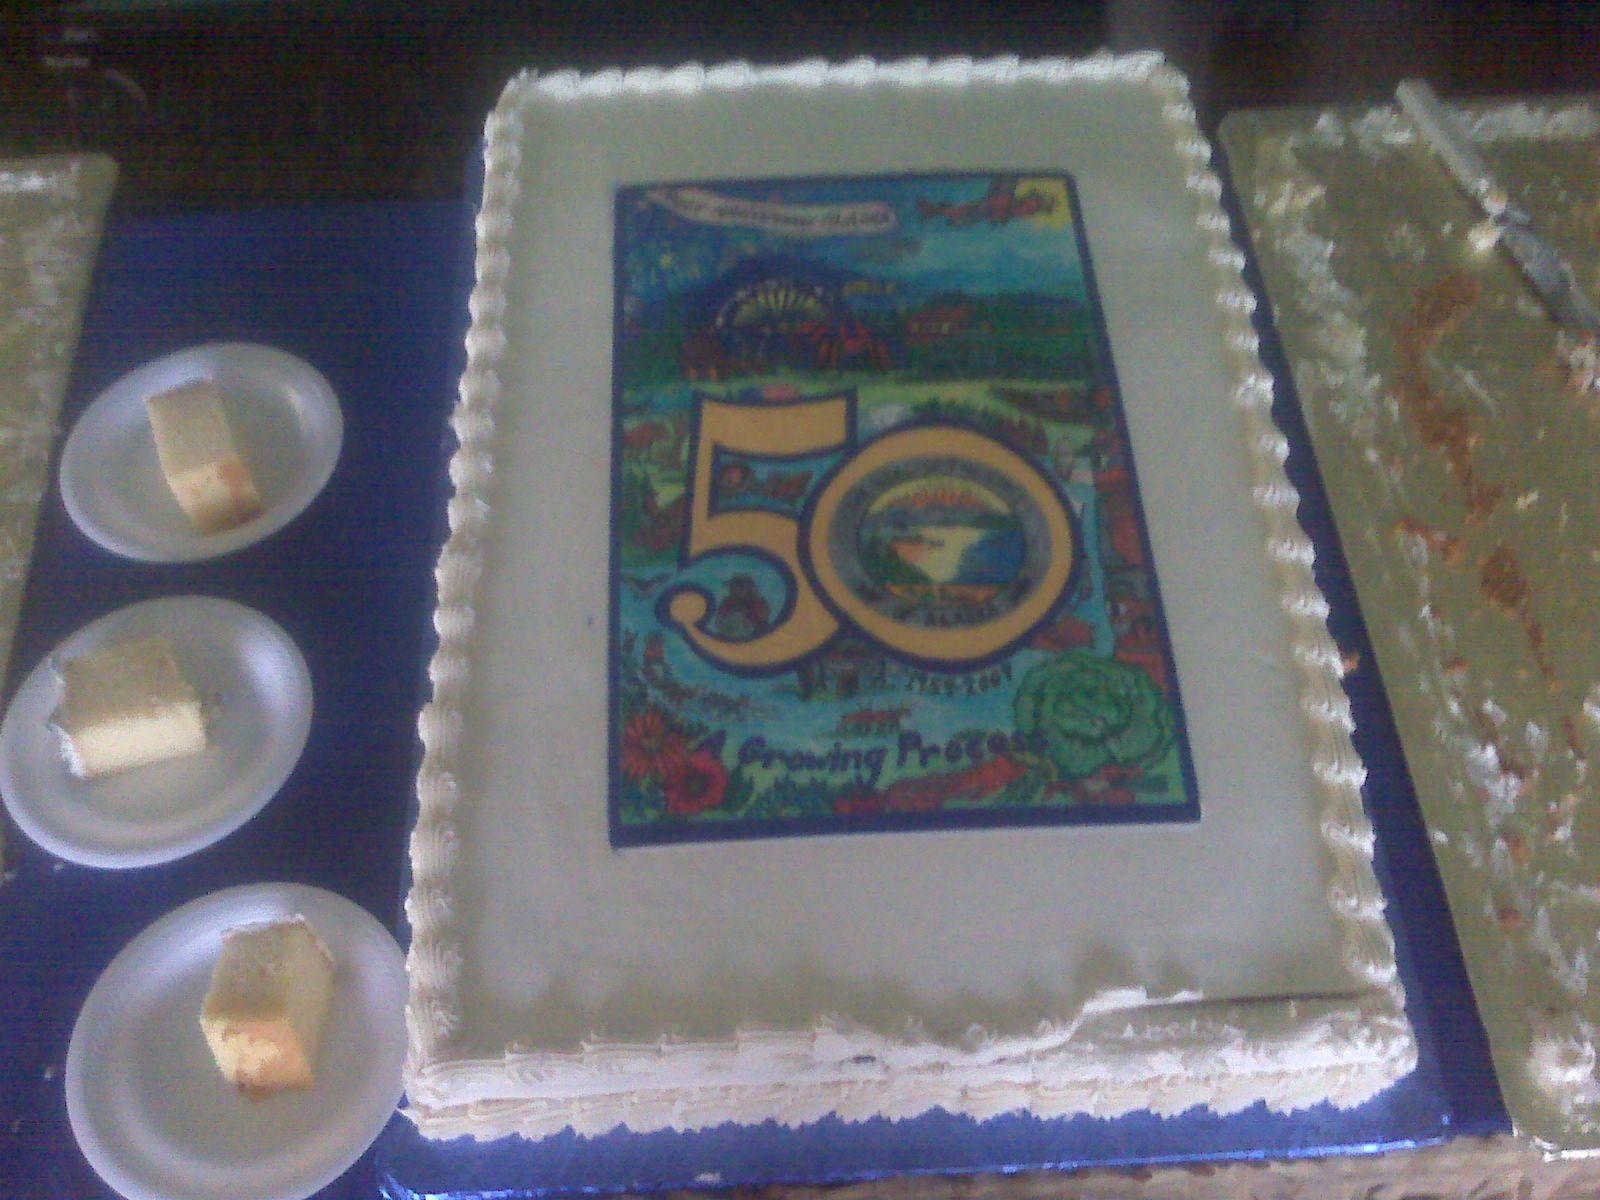 50th anniversary of statehood